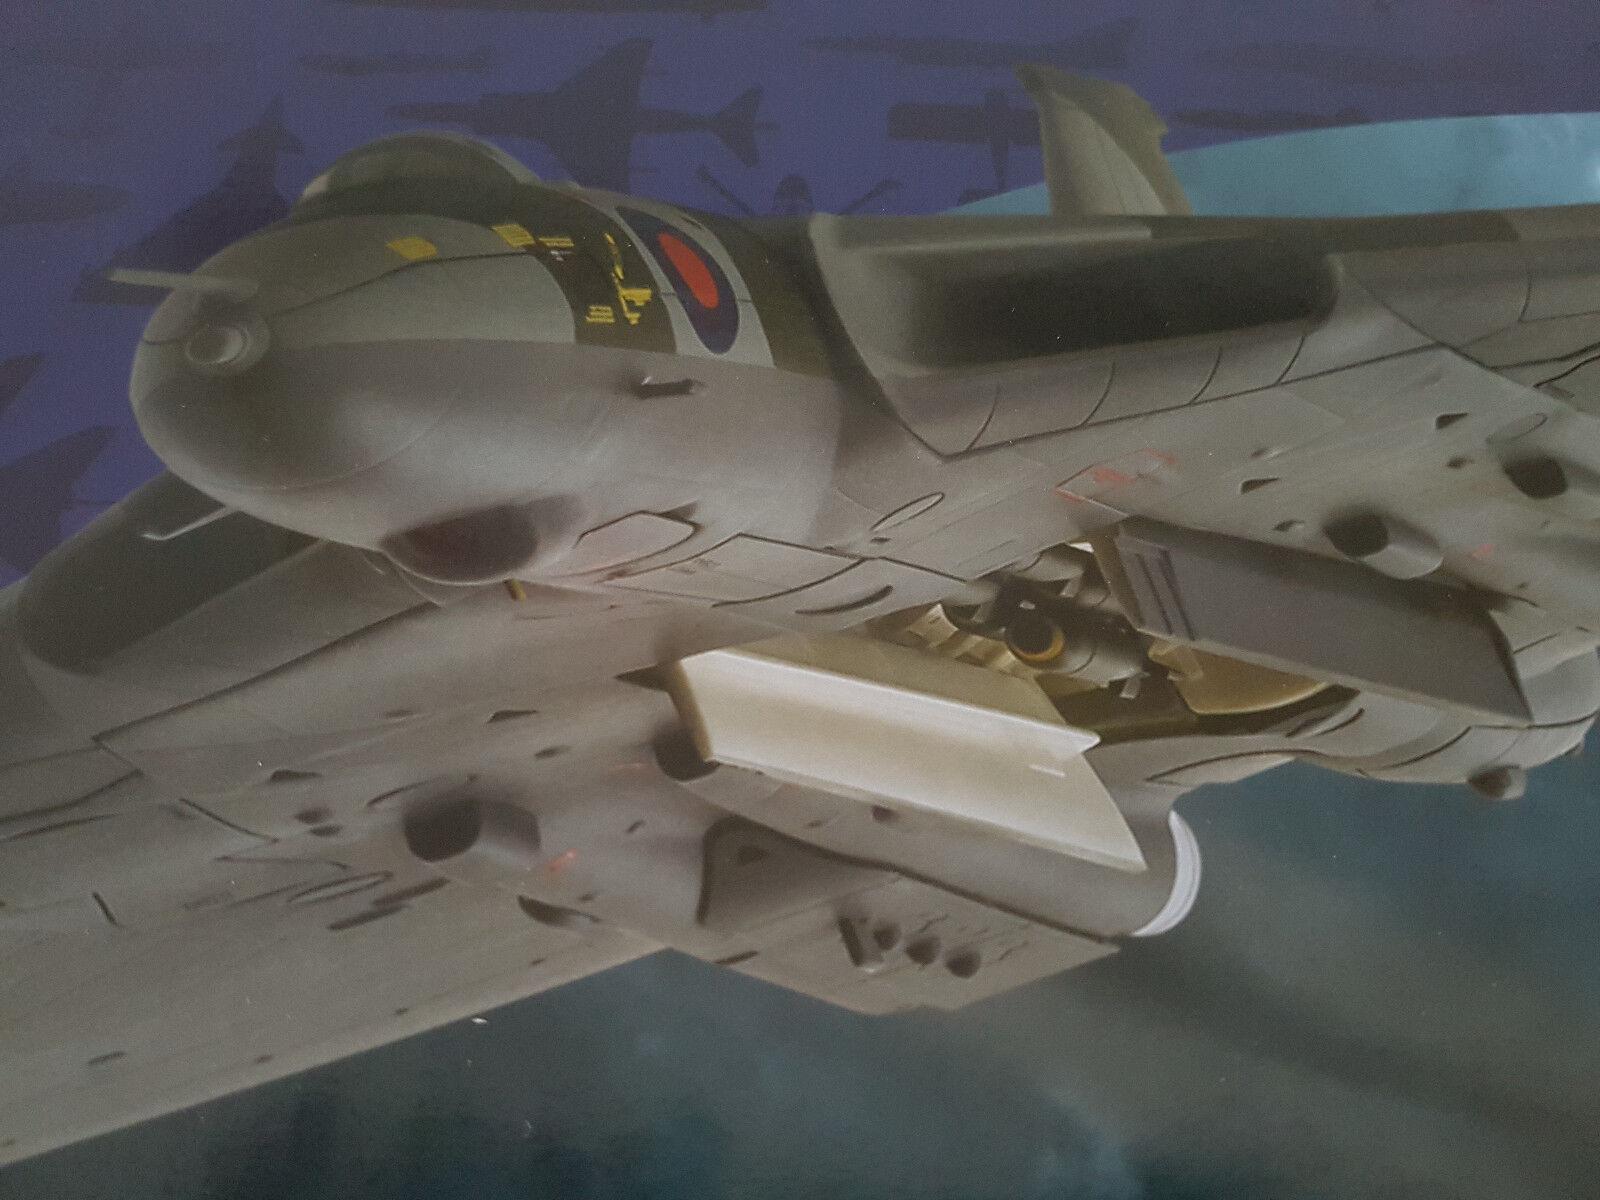 Ltd. New  Corgi Avro Vulcan b2 RAF 44th Sqn  Operación nero Buck  aa27203 1 72